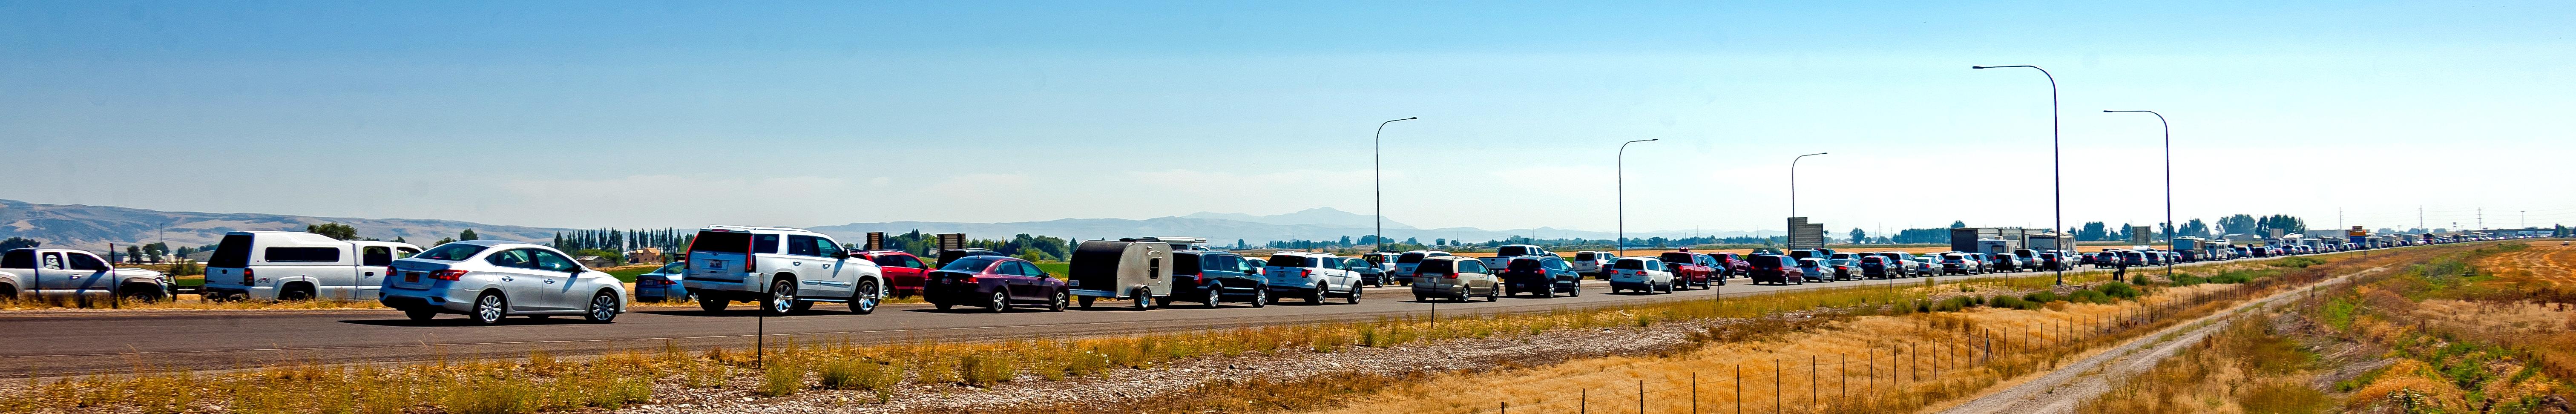 Traffic jam eclipse 2017 us